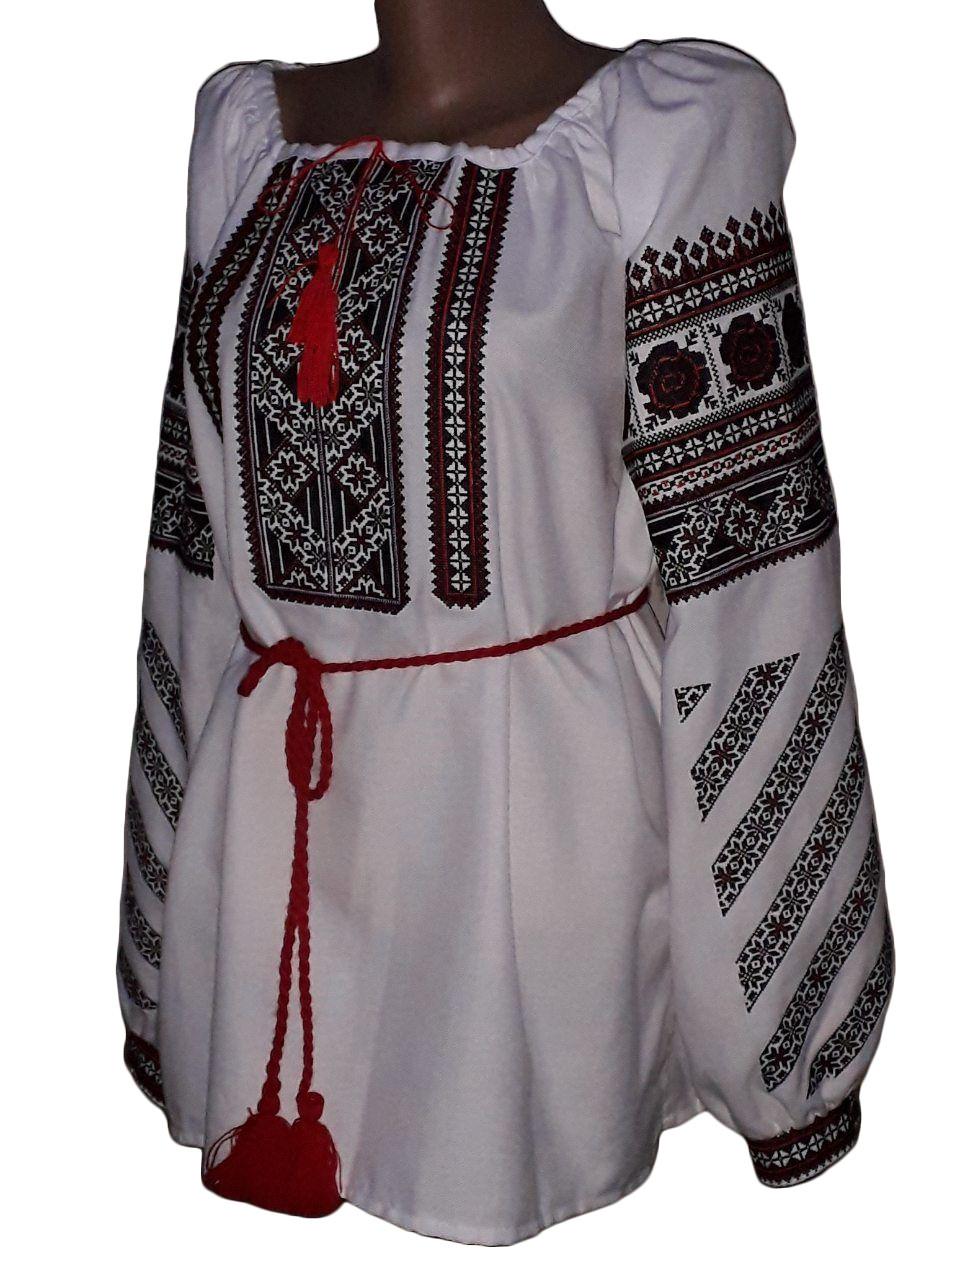 "Жіноча вишита сорочка (блузка) ""Люсінда"" (Женская вышитая рубашка (блузка) ""Люсинда"") BN-0028"